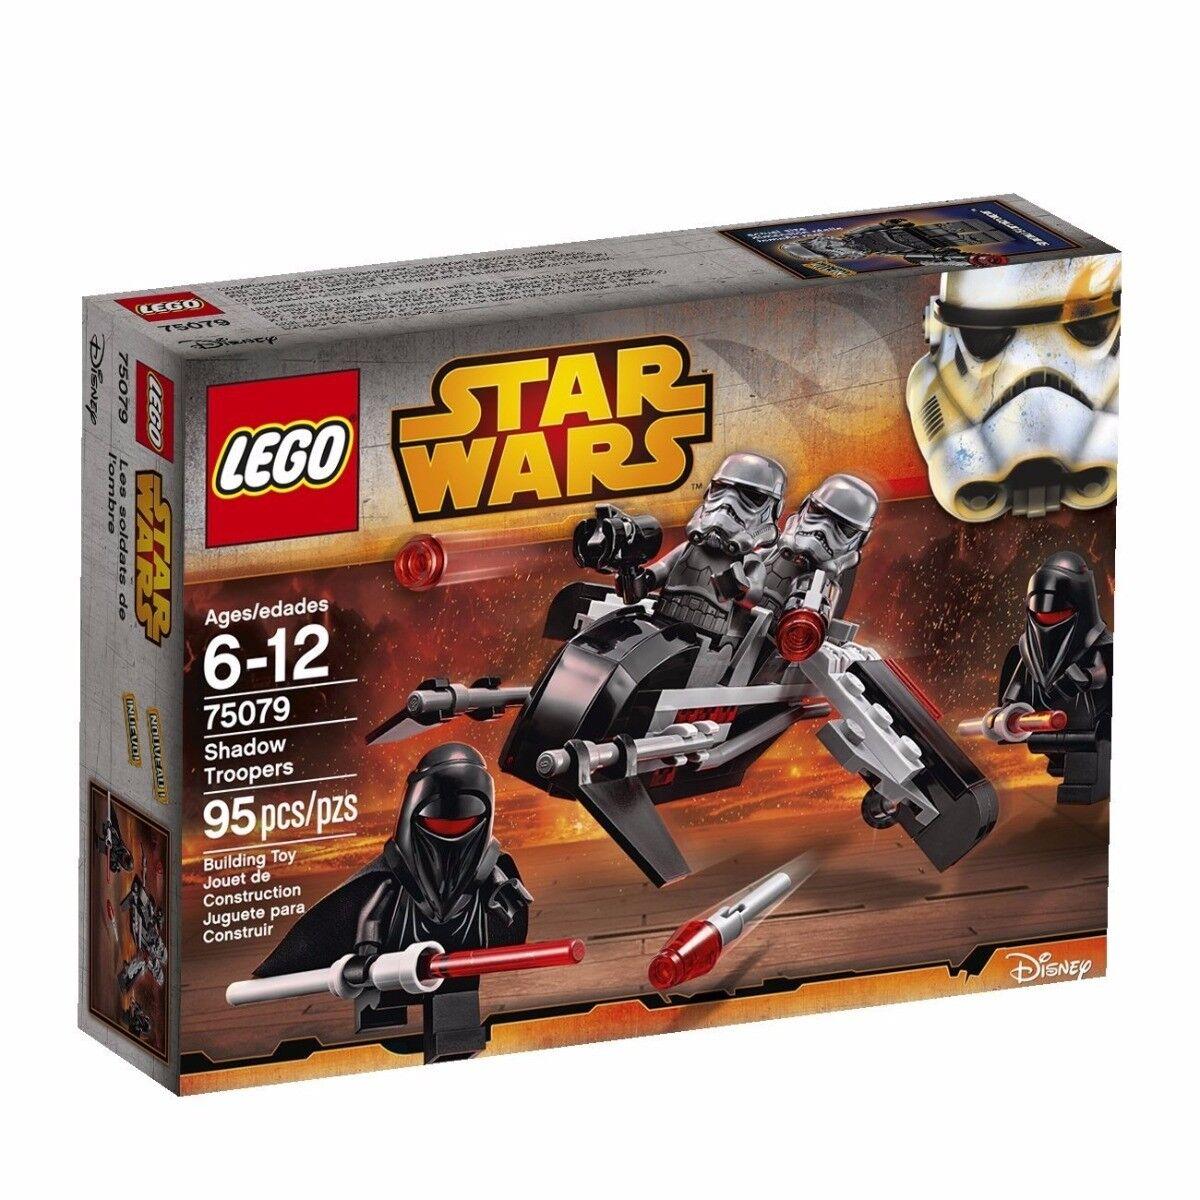 Eldo LEGO Star Wars Shadow Troopers 75079